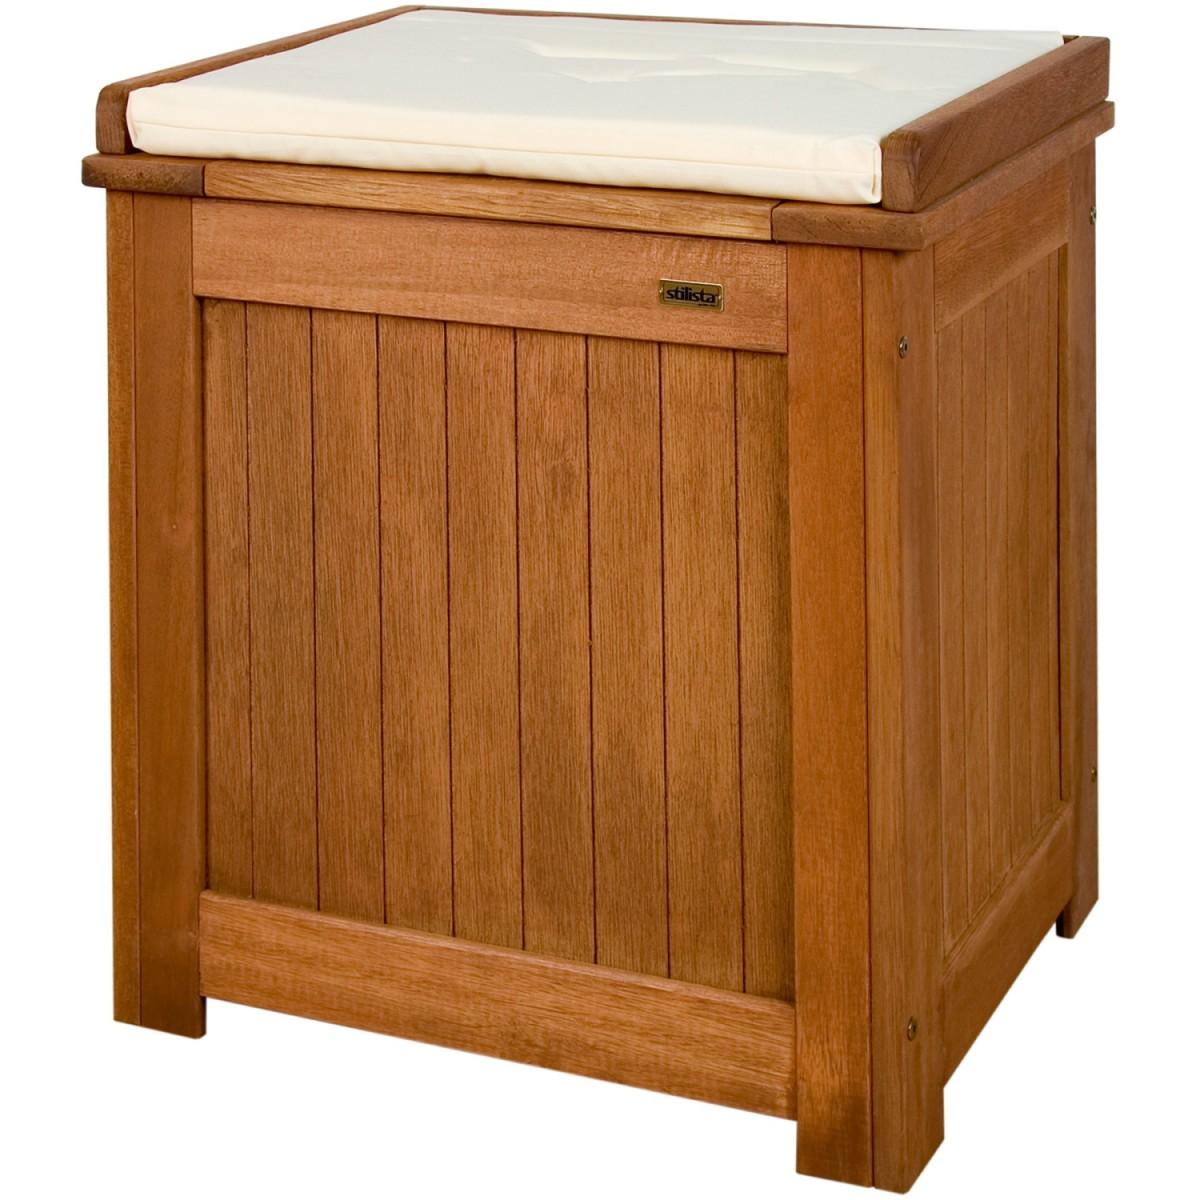 stilista gartenbox inkl kissen natur 43 x 55 x 62 cm gartenm bel garten. Black Bedroom Furniture Sets. Home Design Ideas